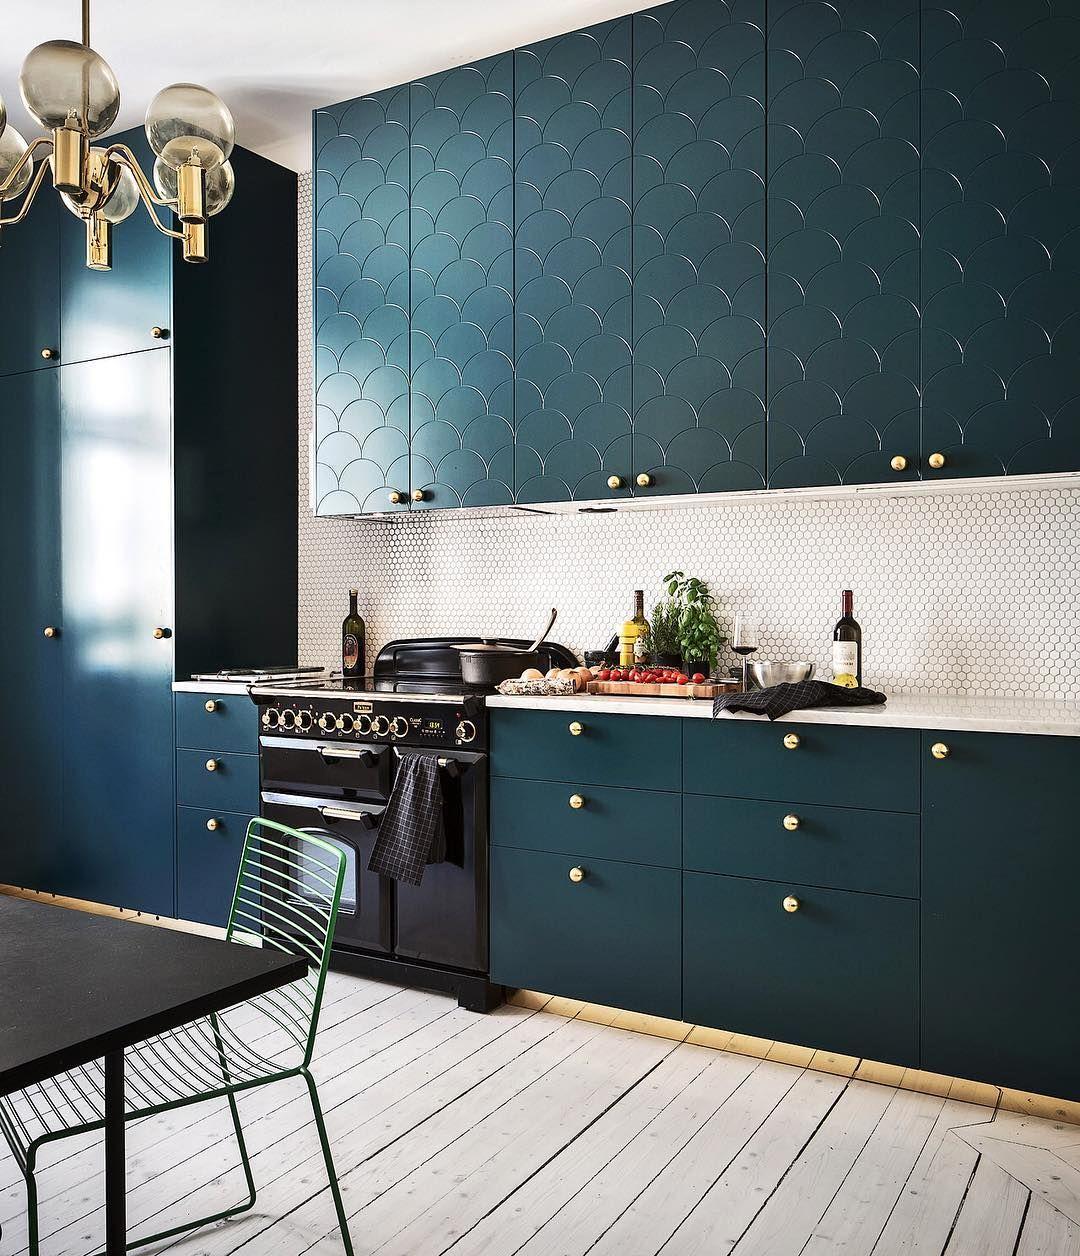 Dark Slate Gray Kitchen For The Home Decor Pinterest Gray - Slate gray kitchen cabinets